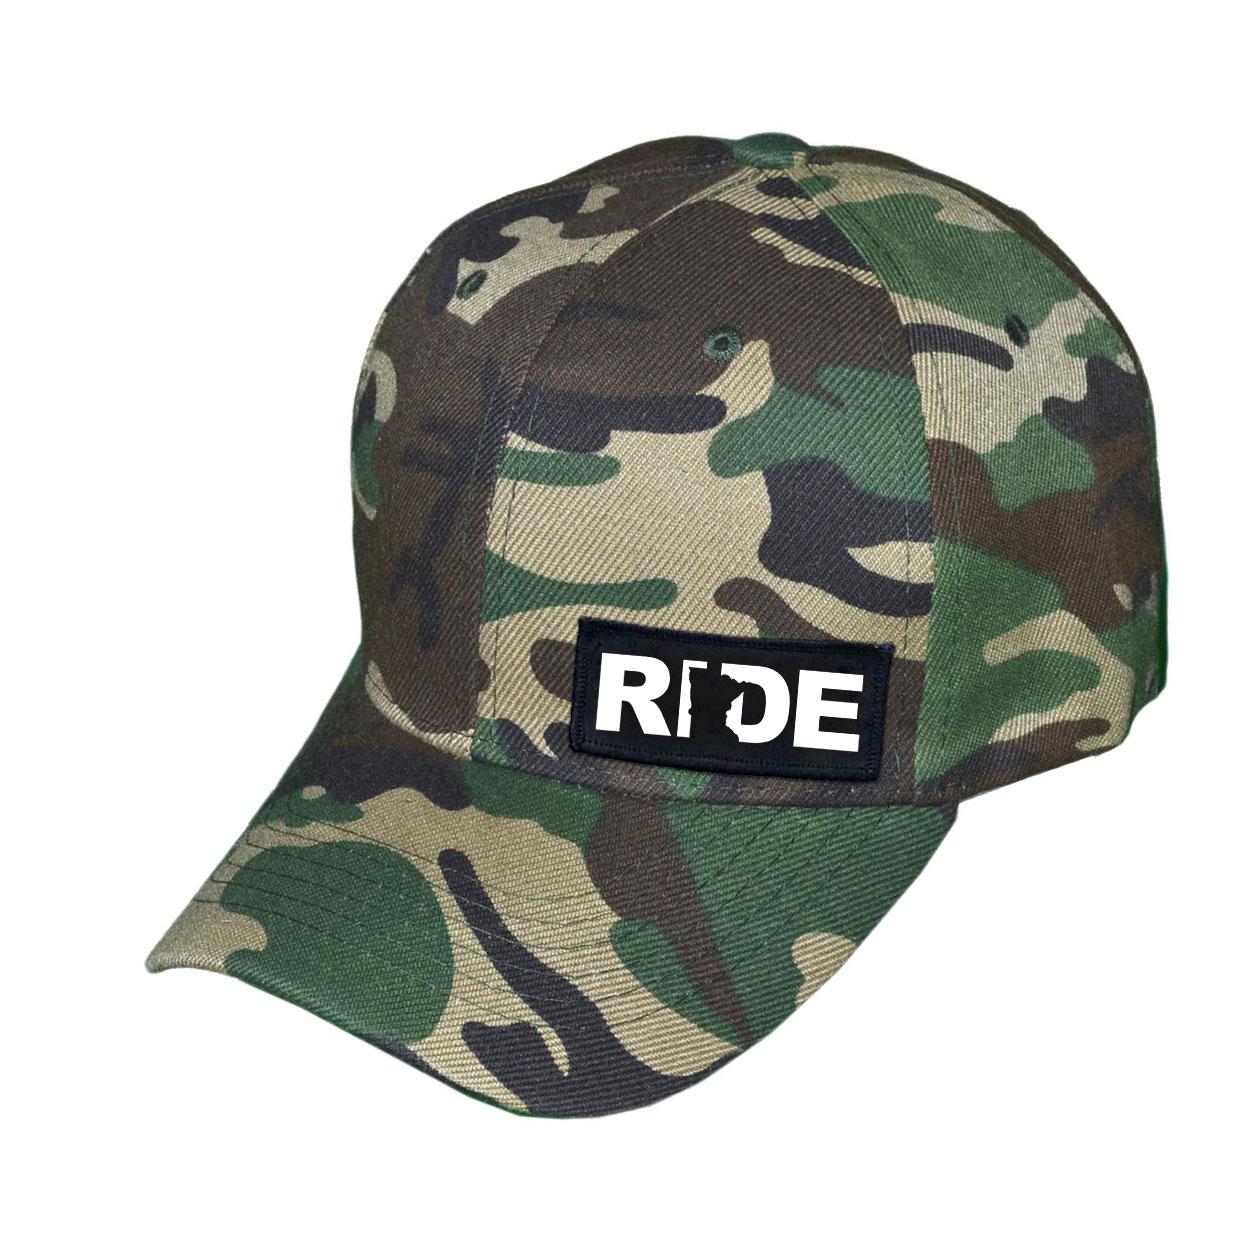 Ride Minnesota Night Out Woven Patch Hat Camo (White Logo)